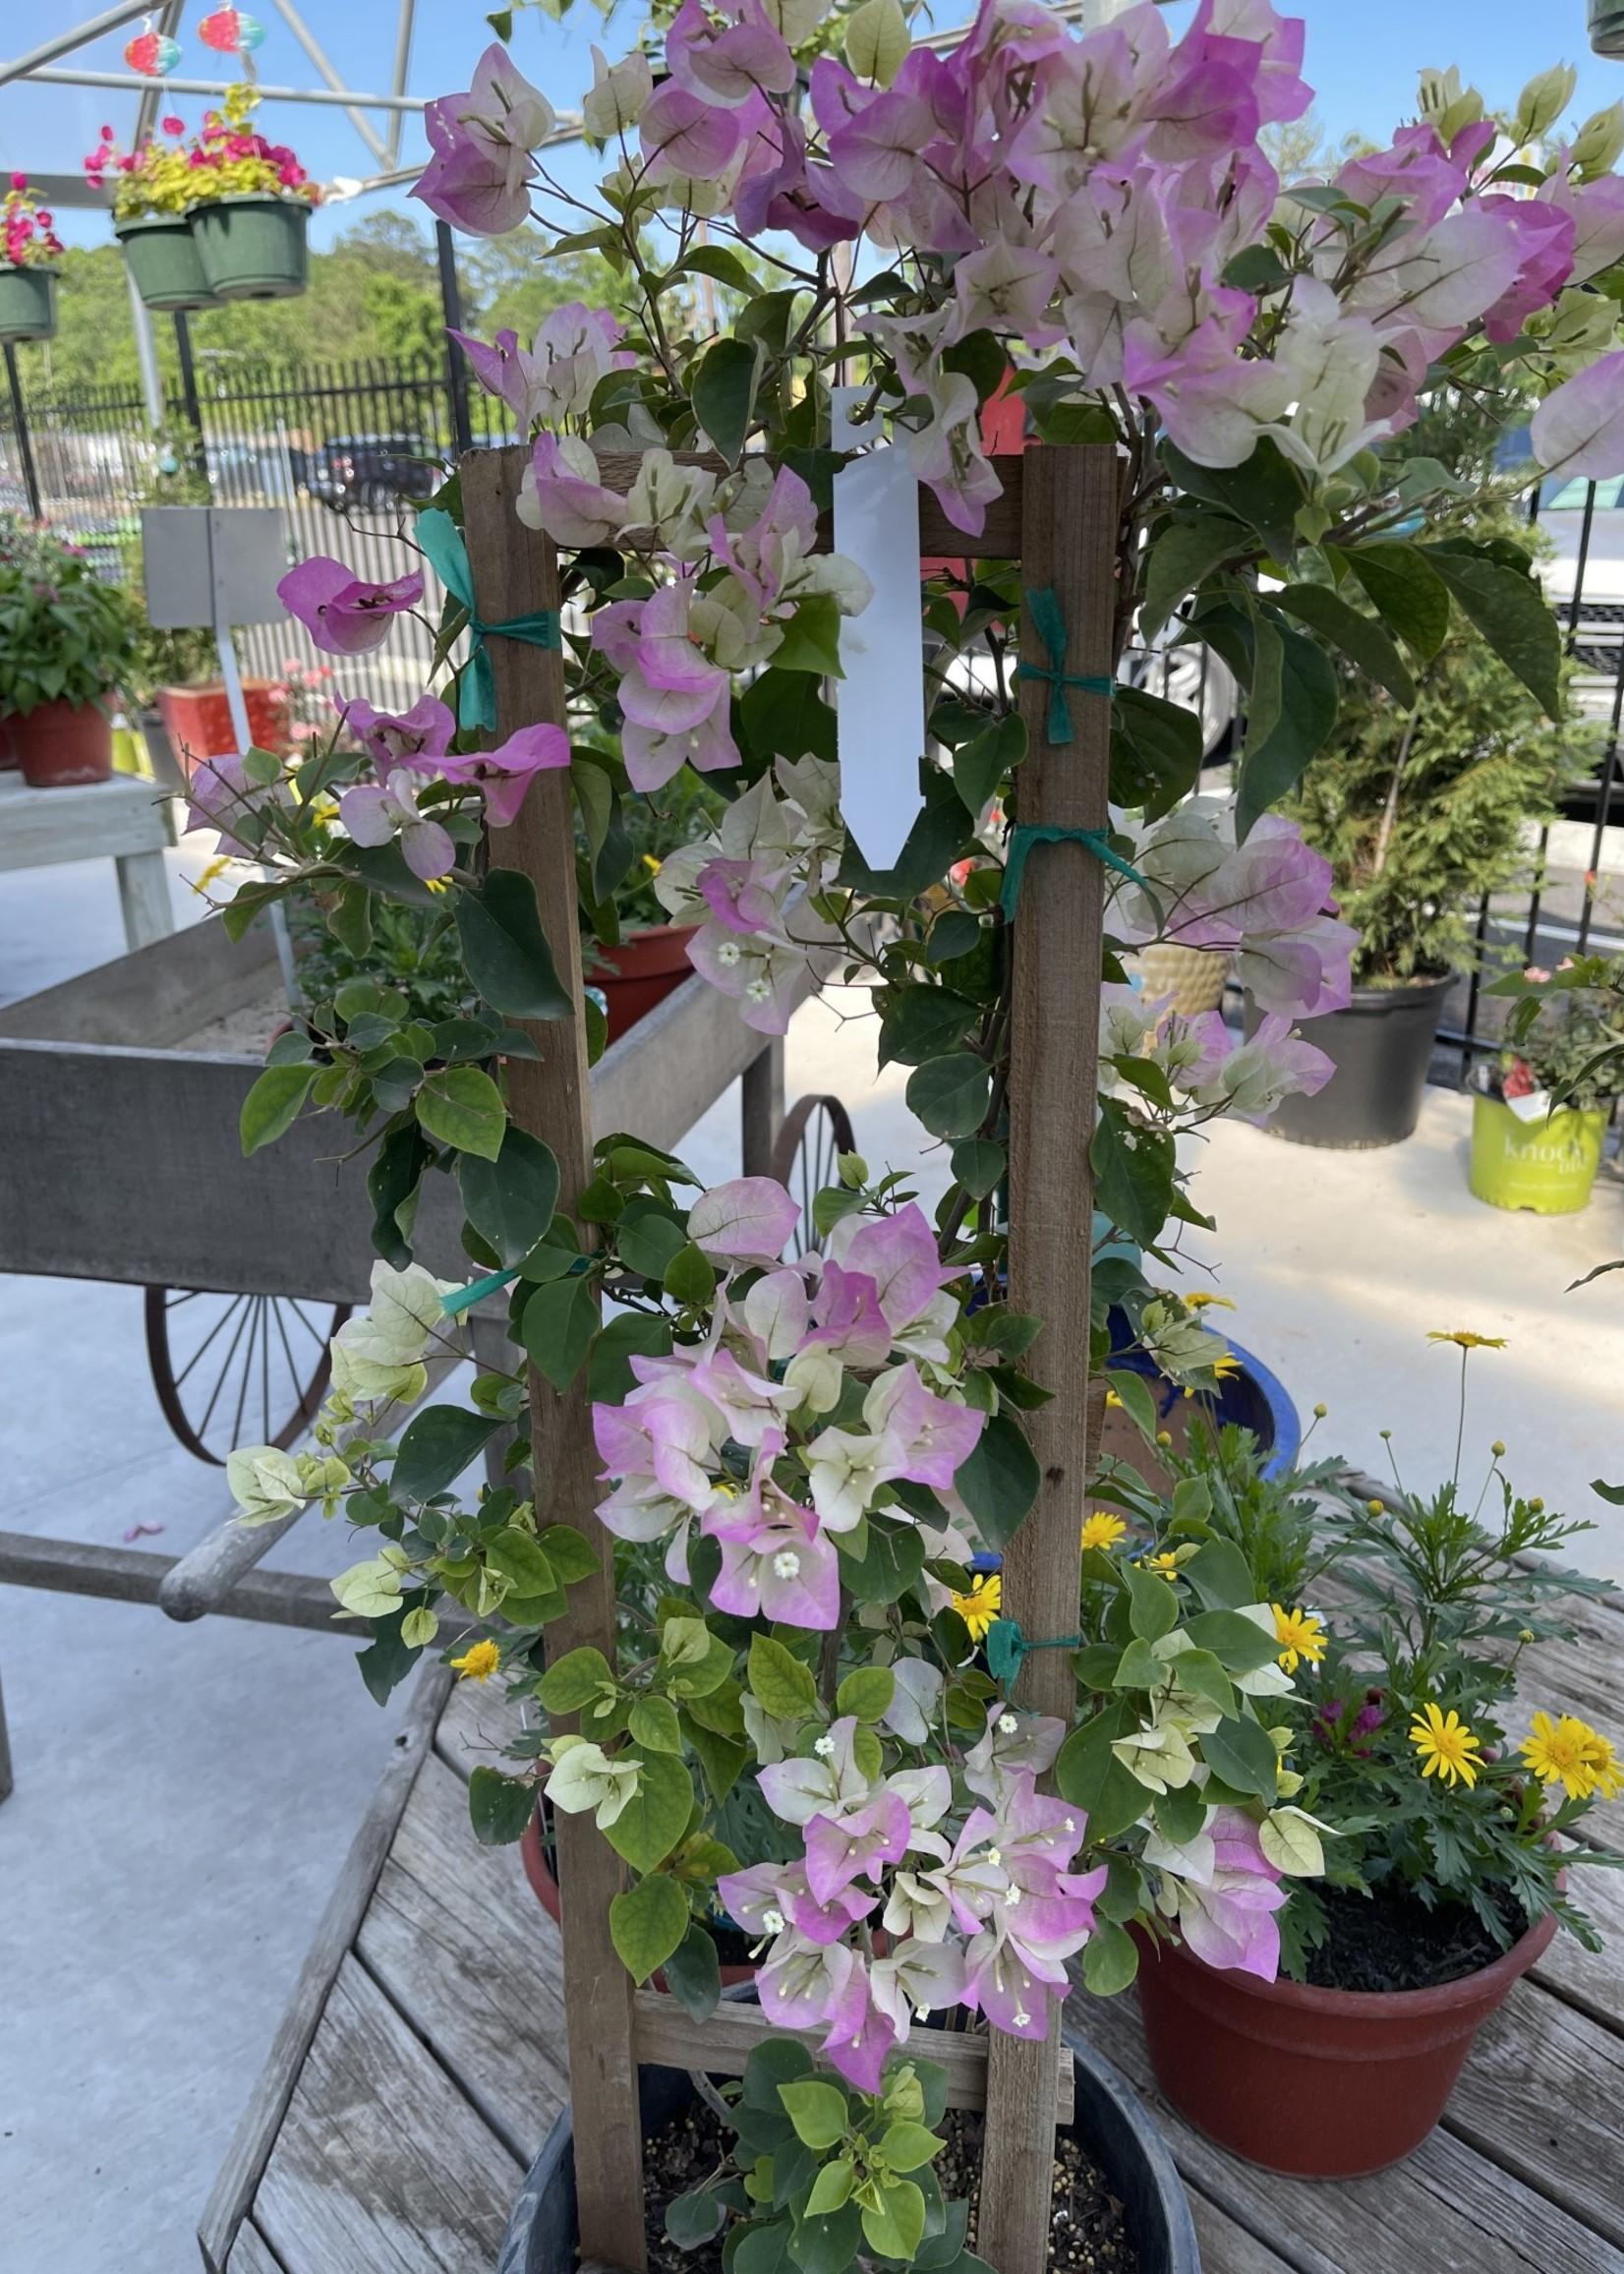 BOUGAINVILLEA, 'Thai Delight' 5G on trellis (bicolor pink)